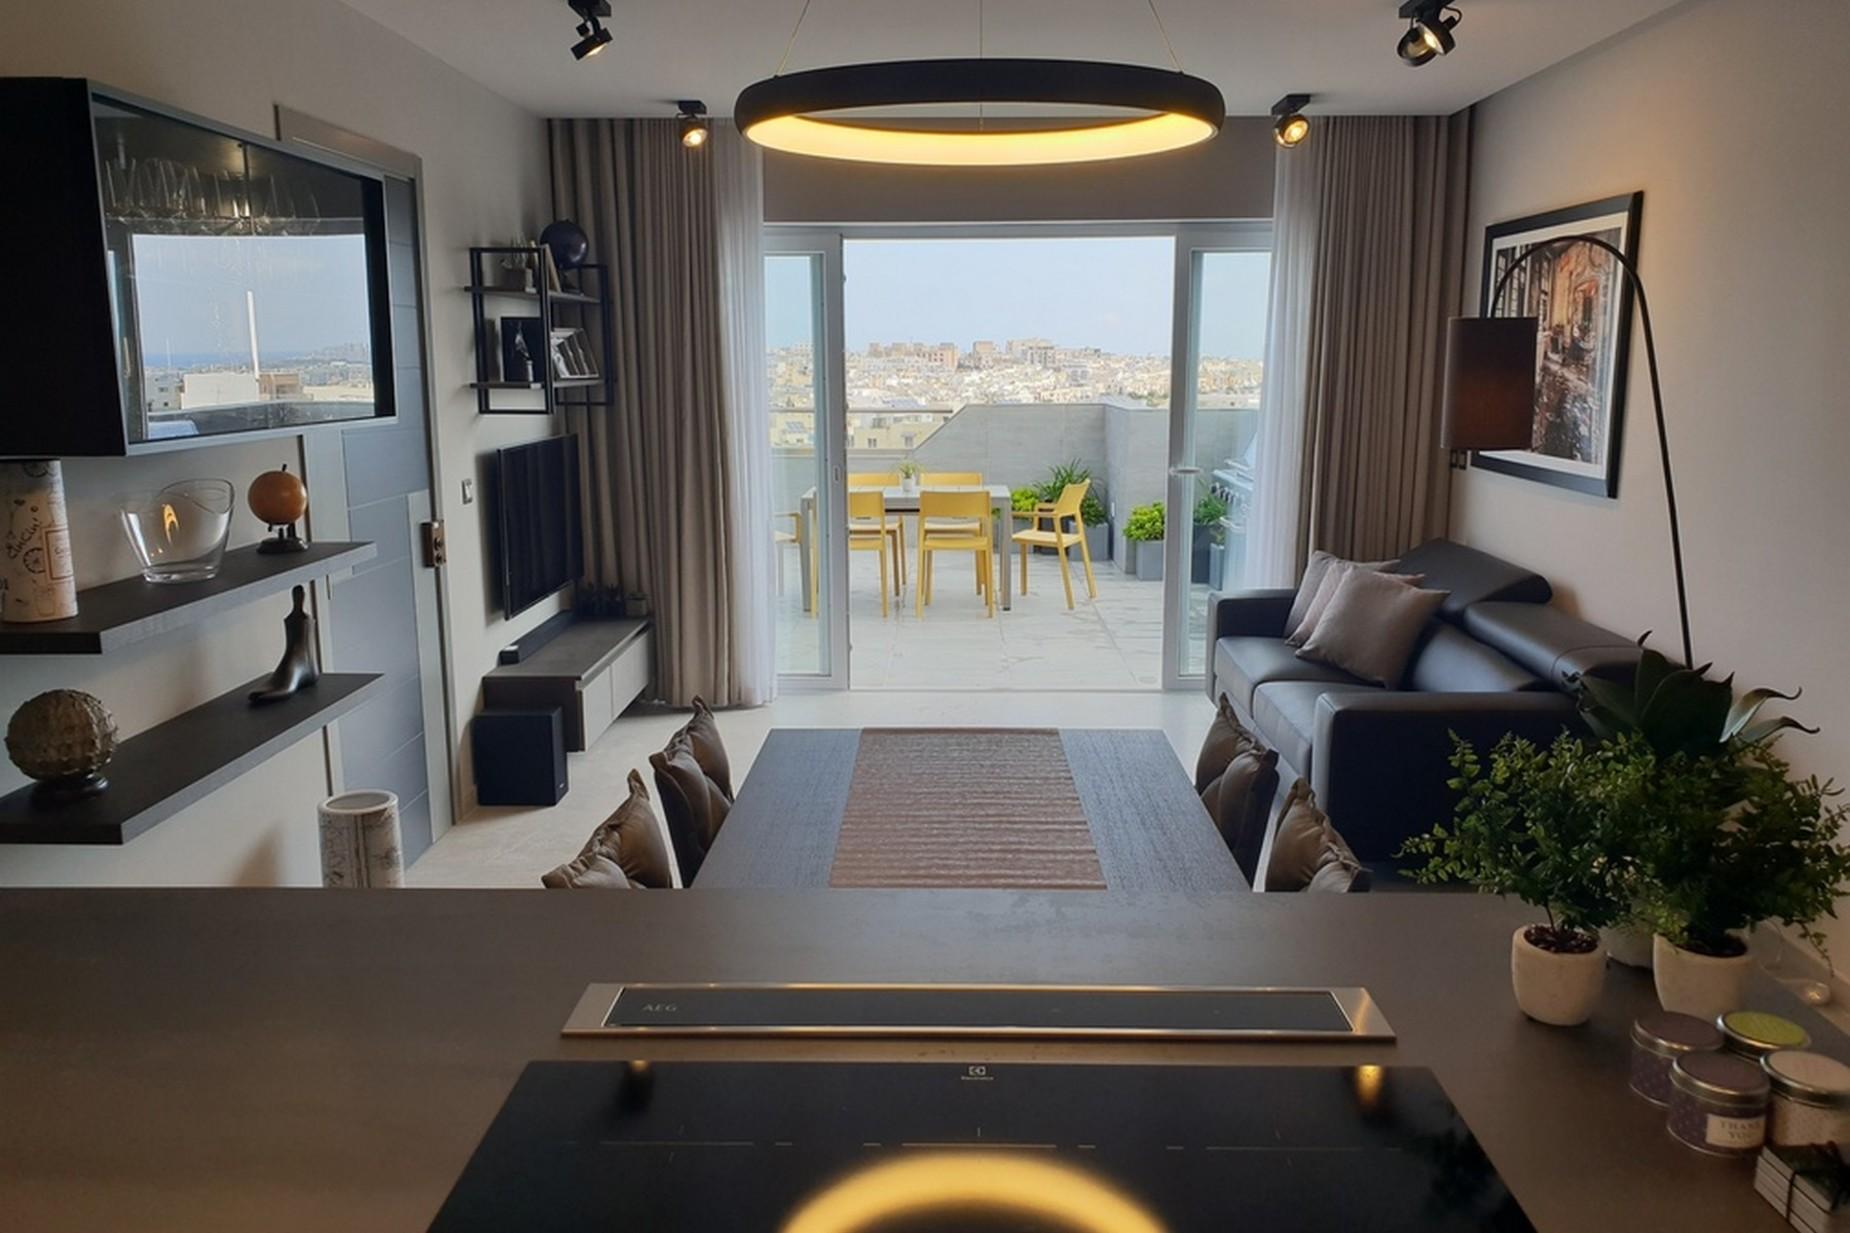 2 bed Apartment For Rent in Birkirkara, Birkirkara - thumb 2